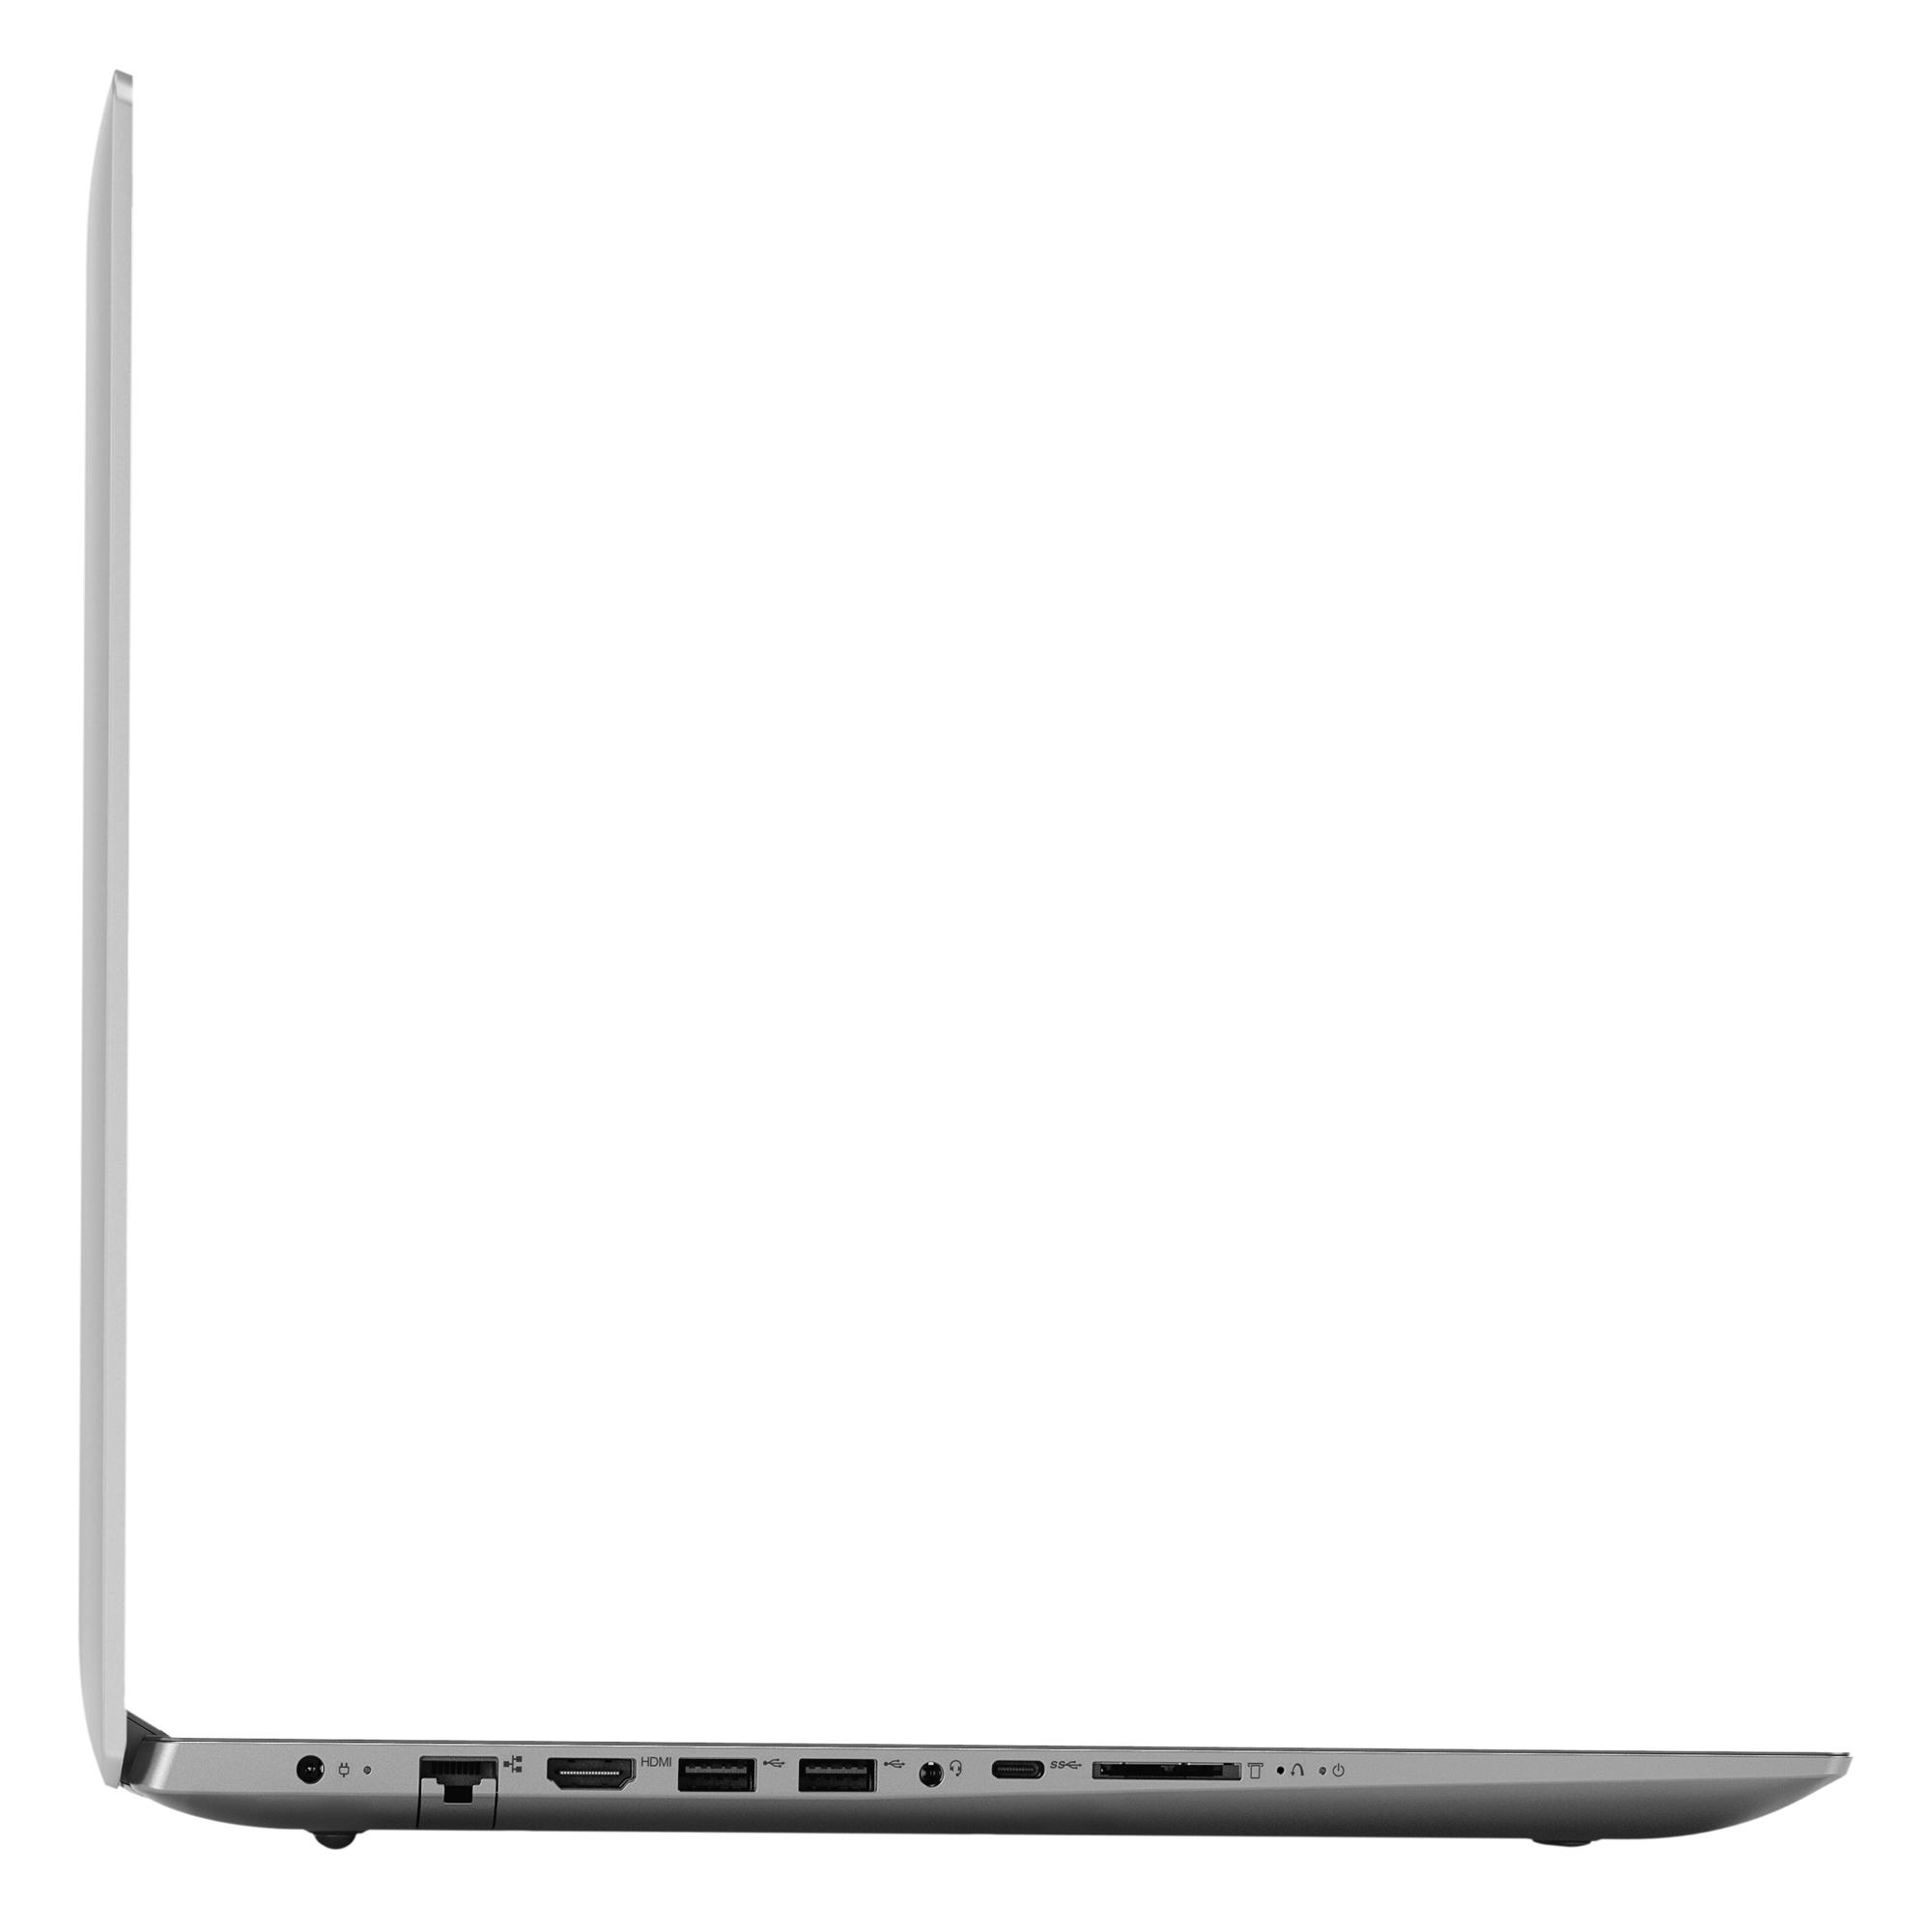 Фото  Ноутбук Lenovo ideapad 330-17IKBR Platinum Grey (81DK0030RA)